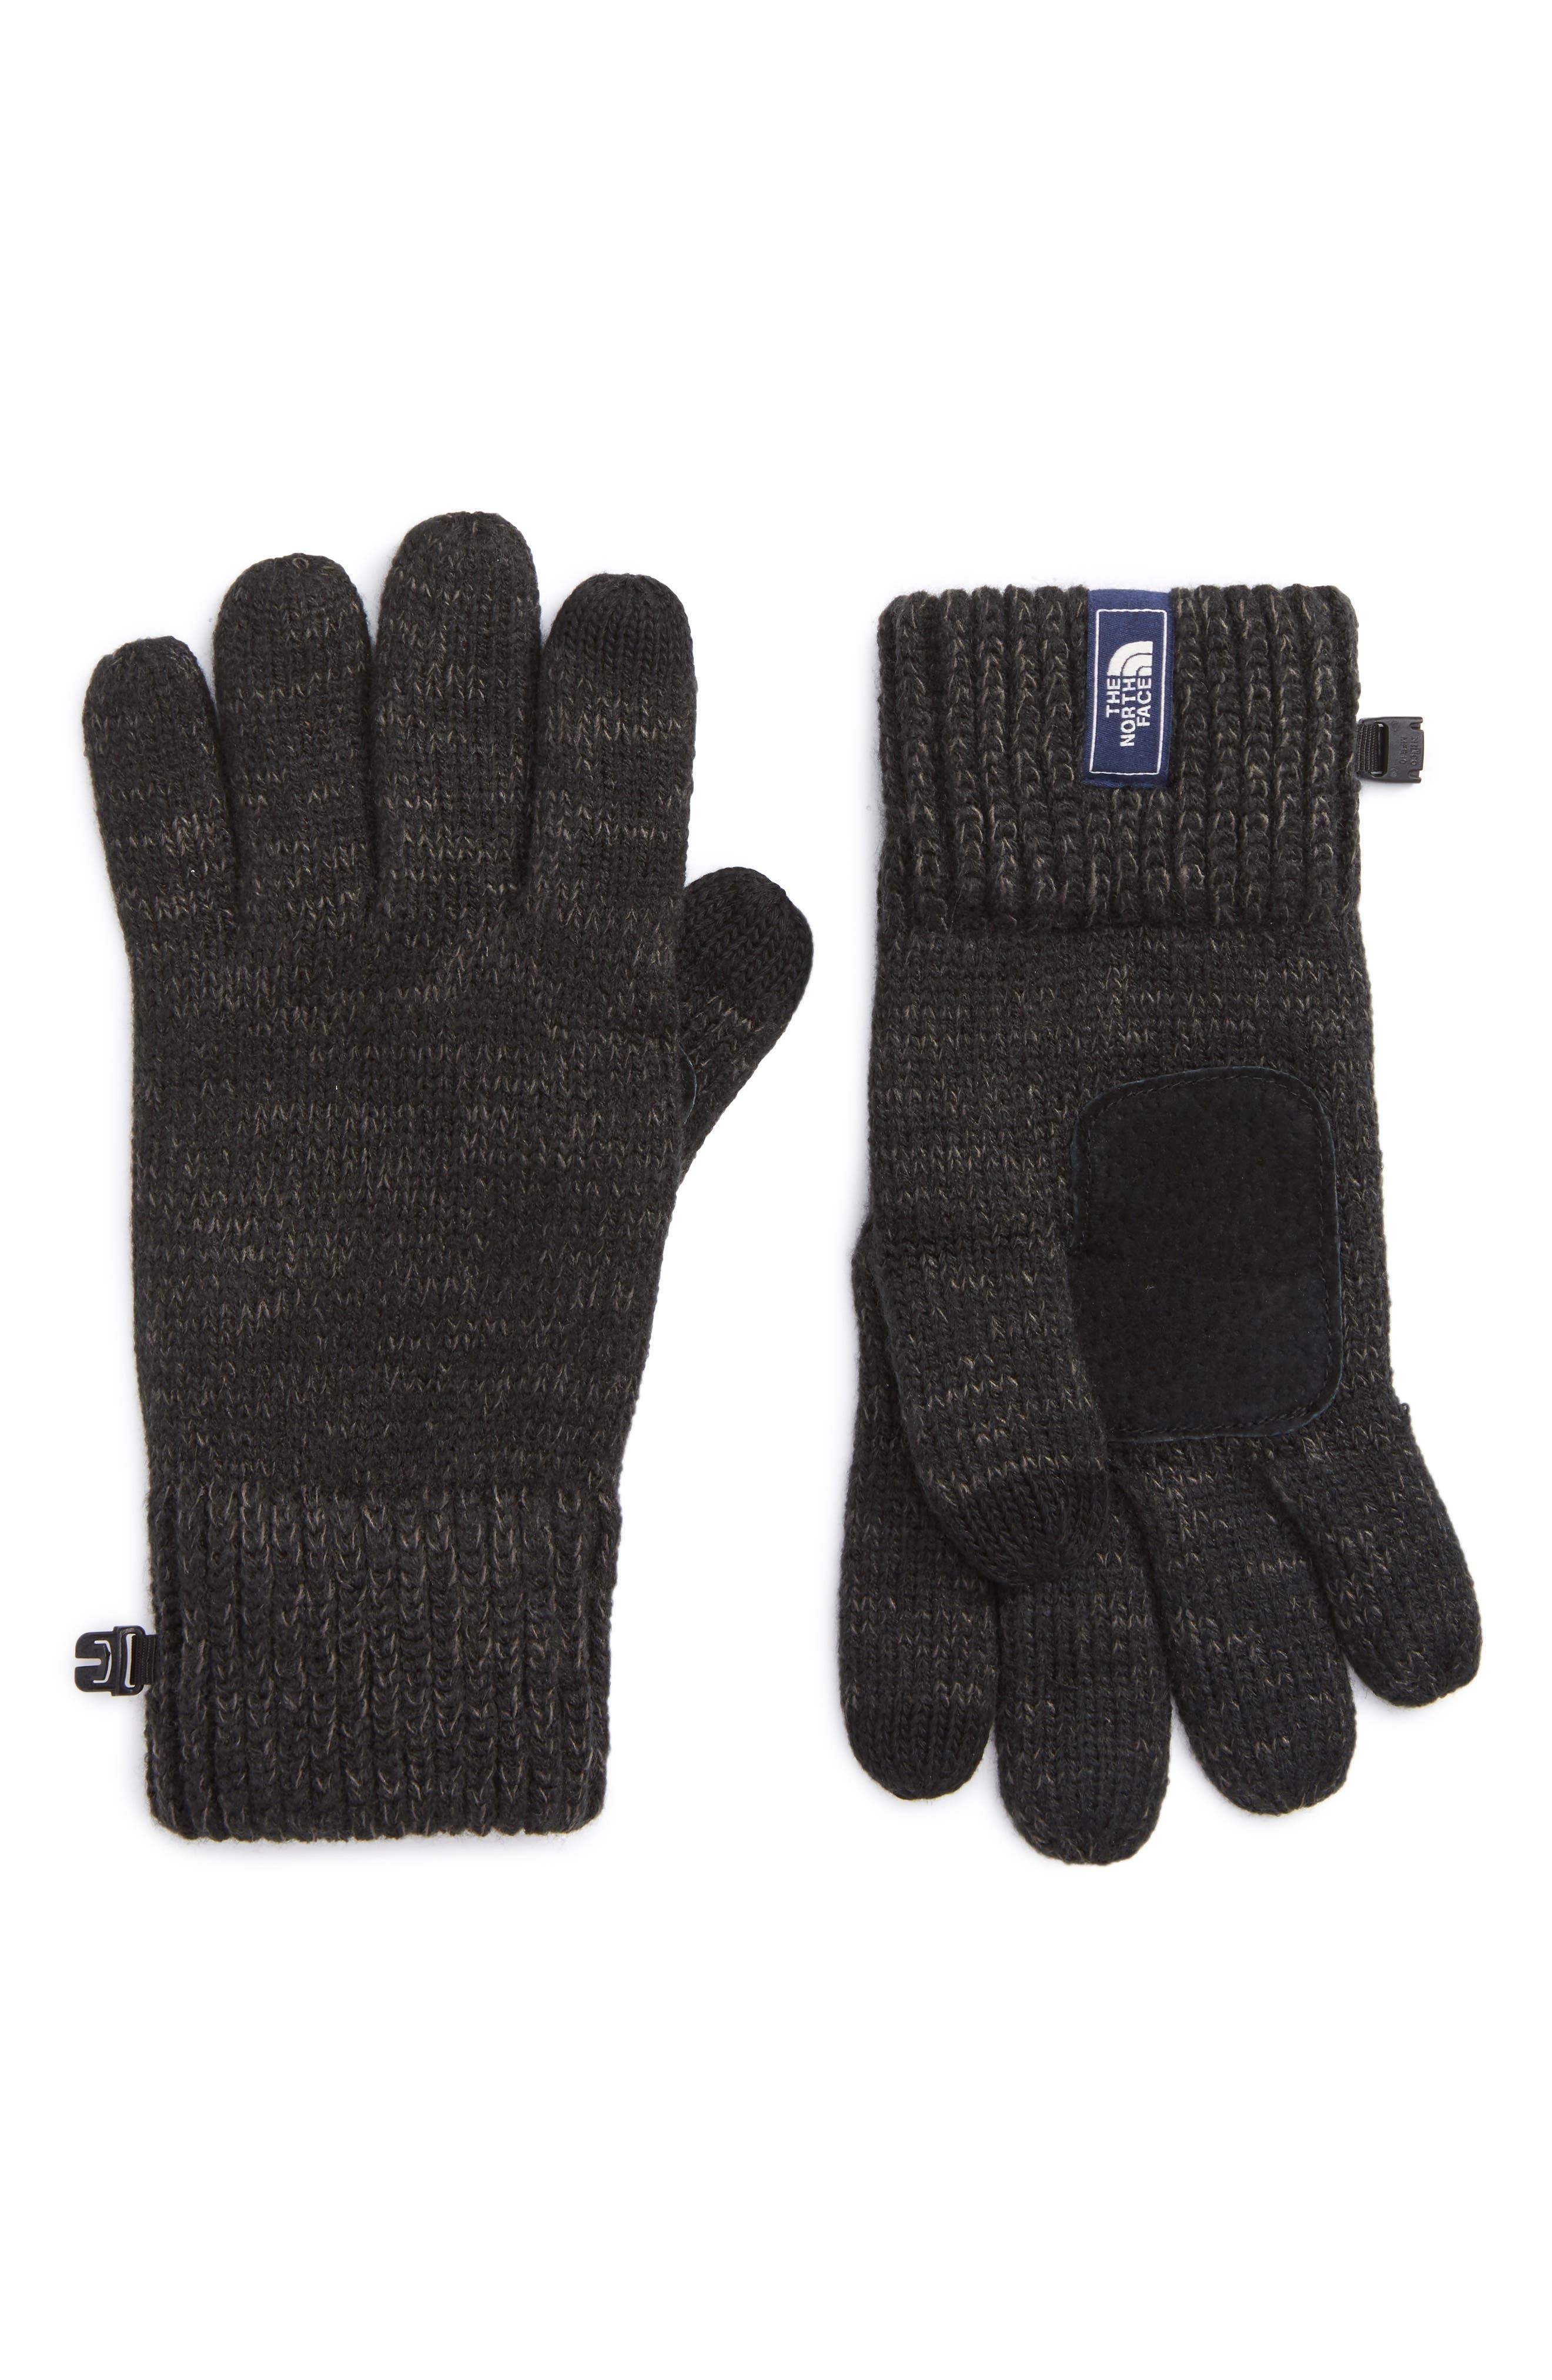 Etip Salty Dog Knit Tech Gloves,                         Main,                         color, Tnf Black